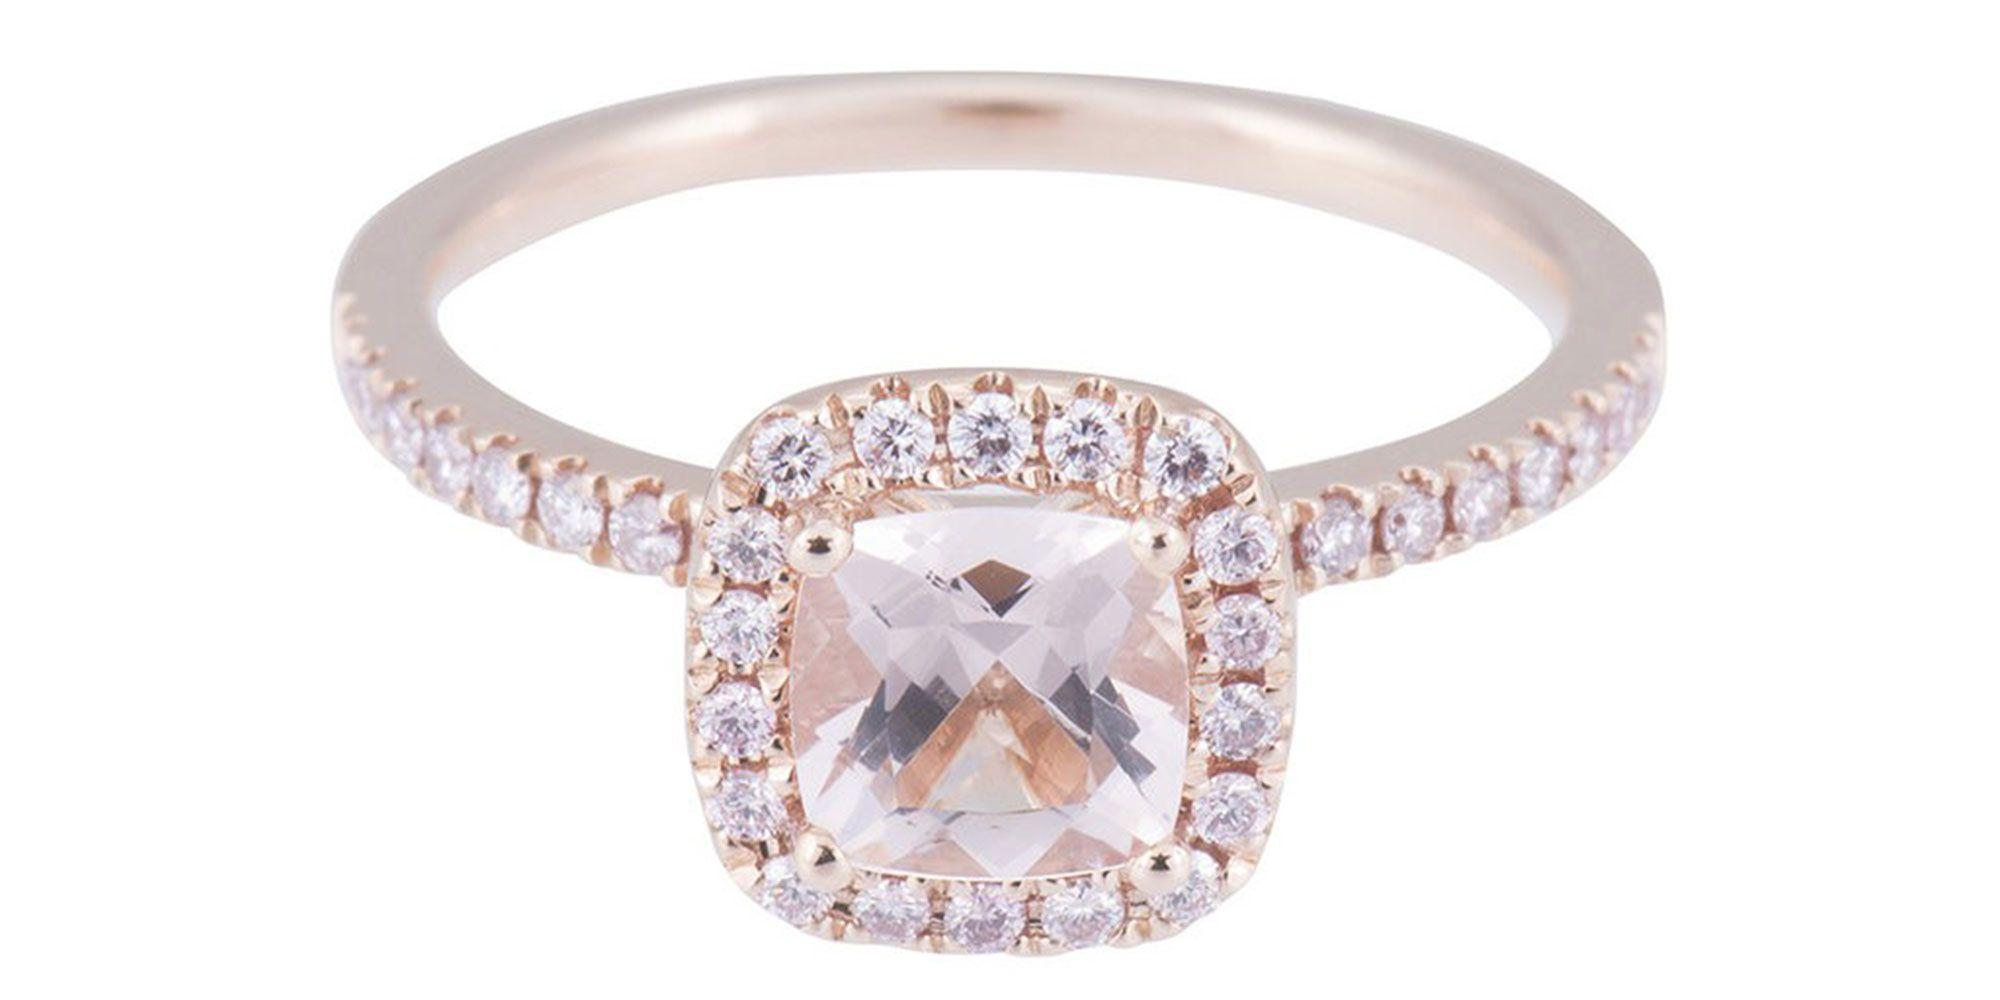 Millennial pink engagement ring